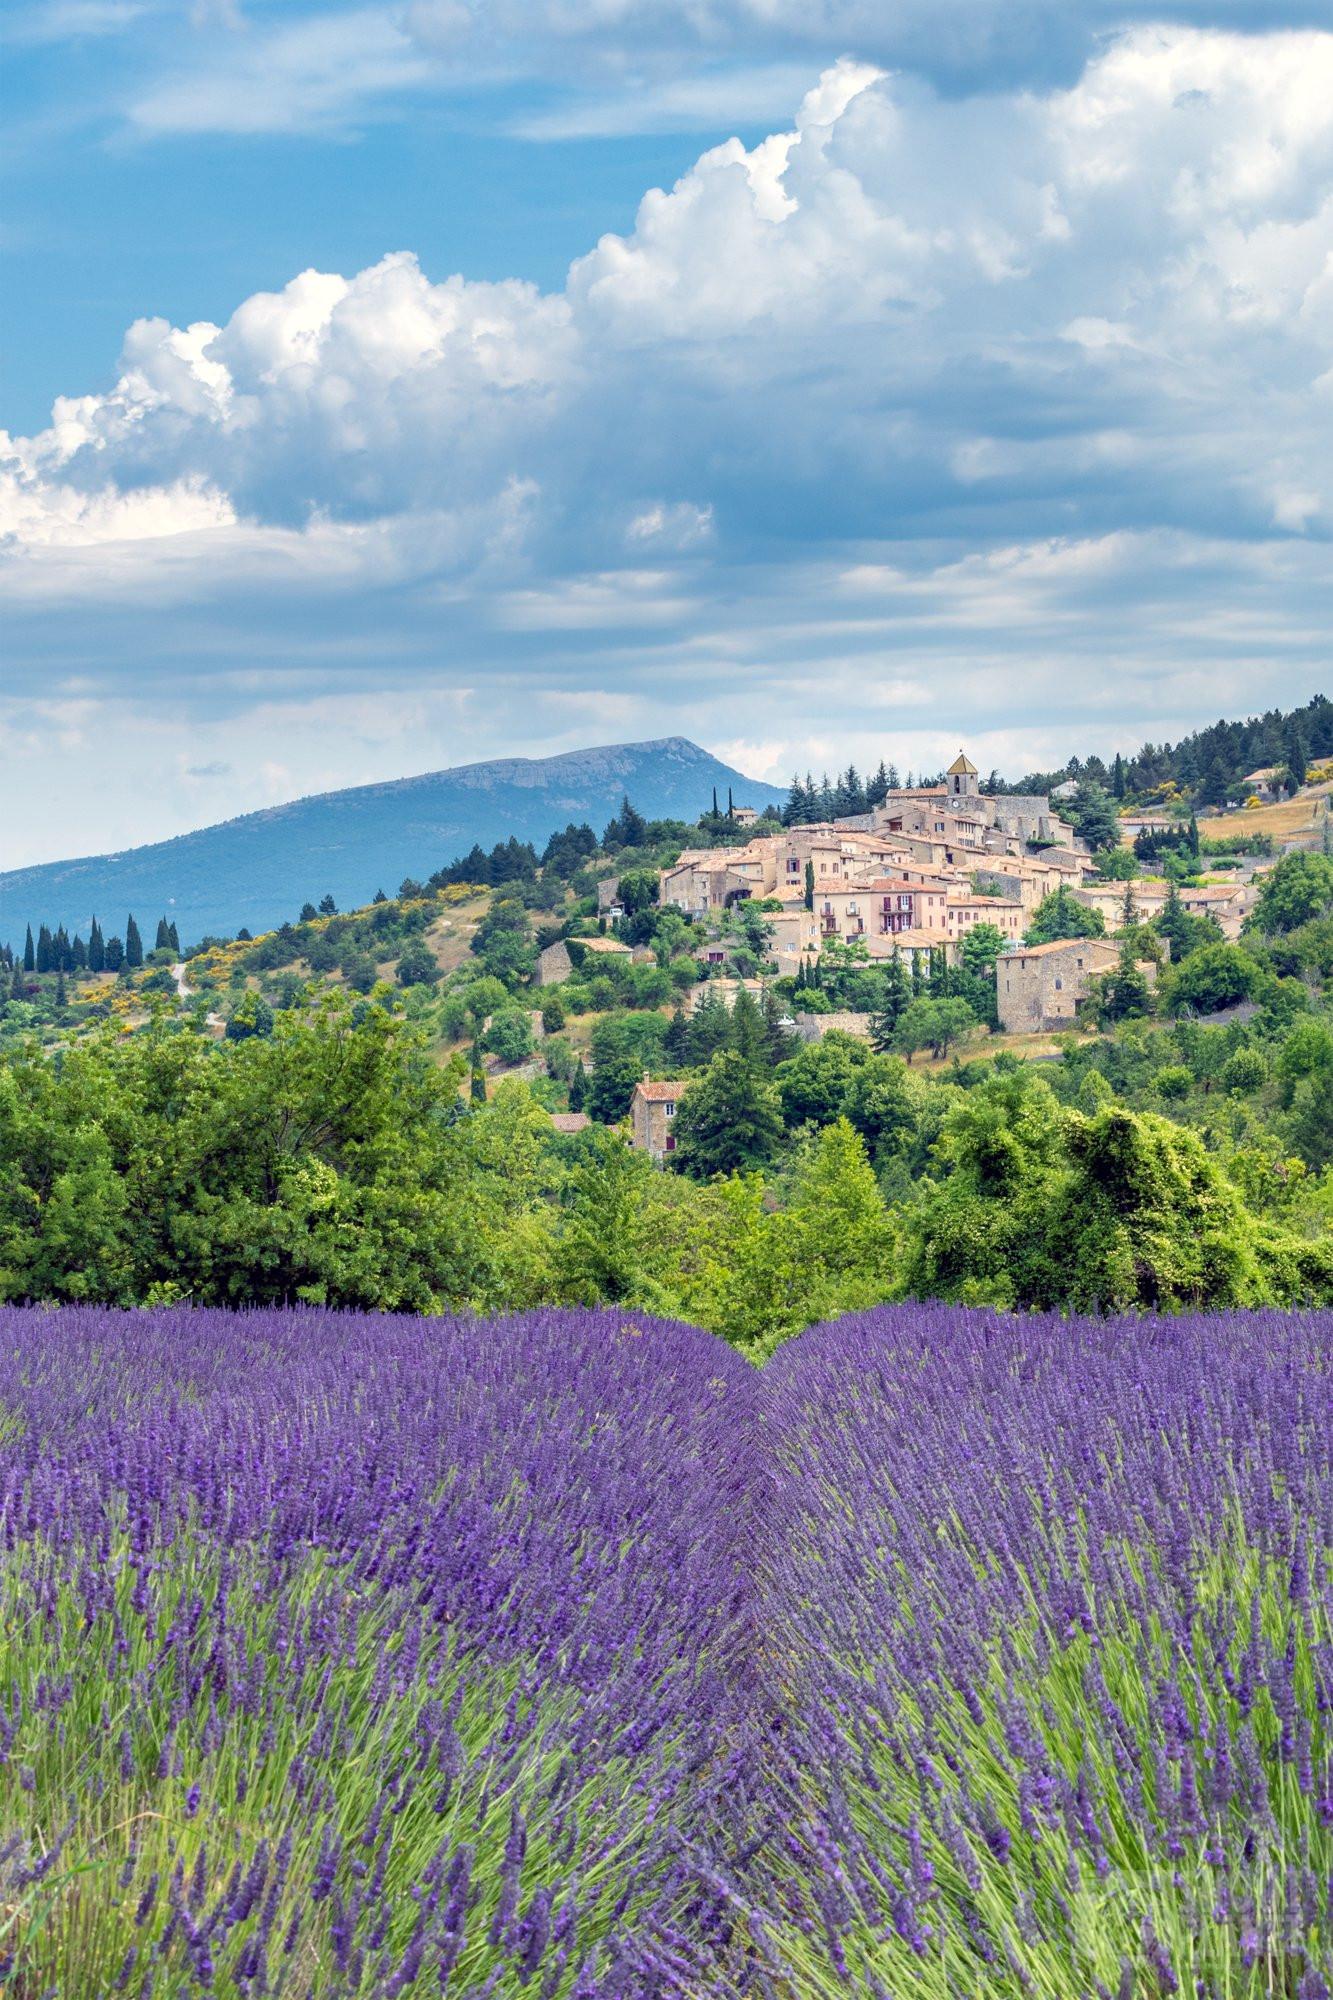 Aurel villlage lavender fields, Drome France